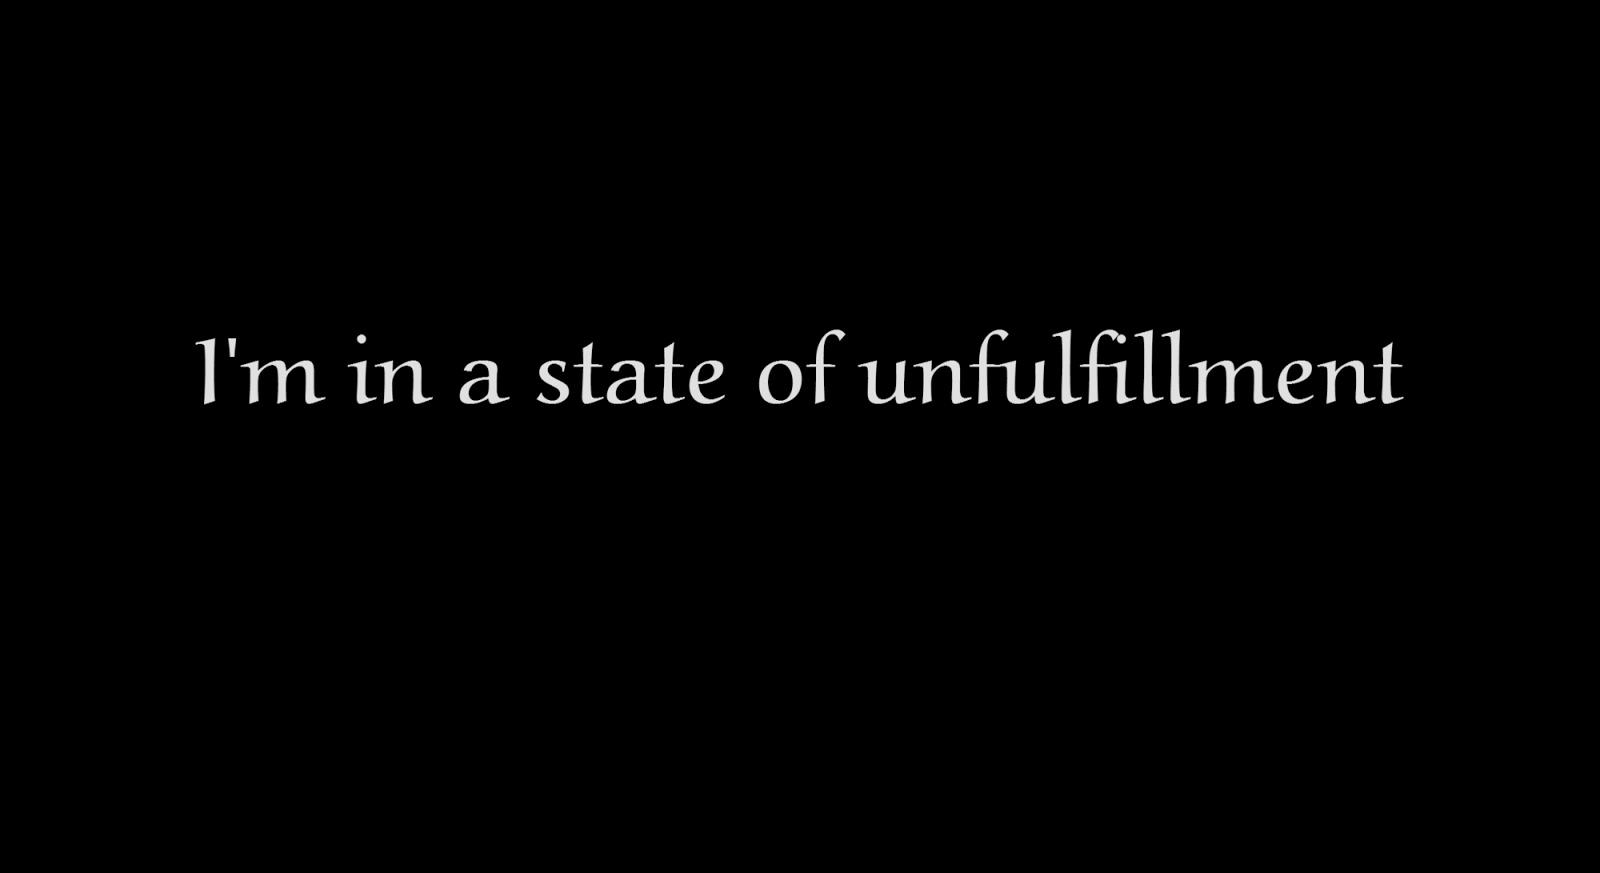 http://1.bp.blogspot.com/-CvJhP0O49zQ/UzqzGZ8vtyI/AAAAAAAACCg/2Y8NkDfdlu0/s1600/I'm+in+a+state+of+unfulfillment.jpg